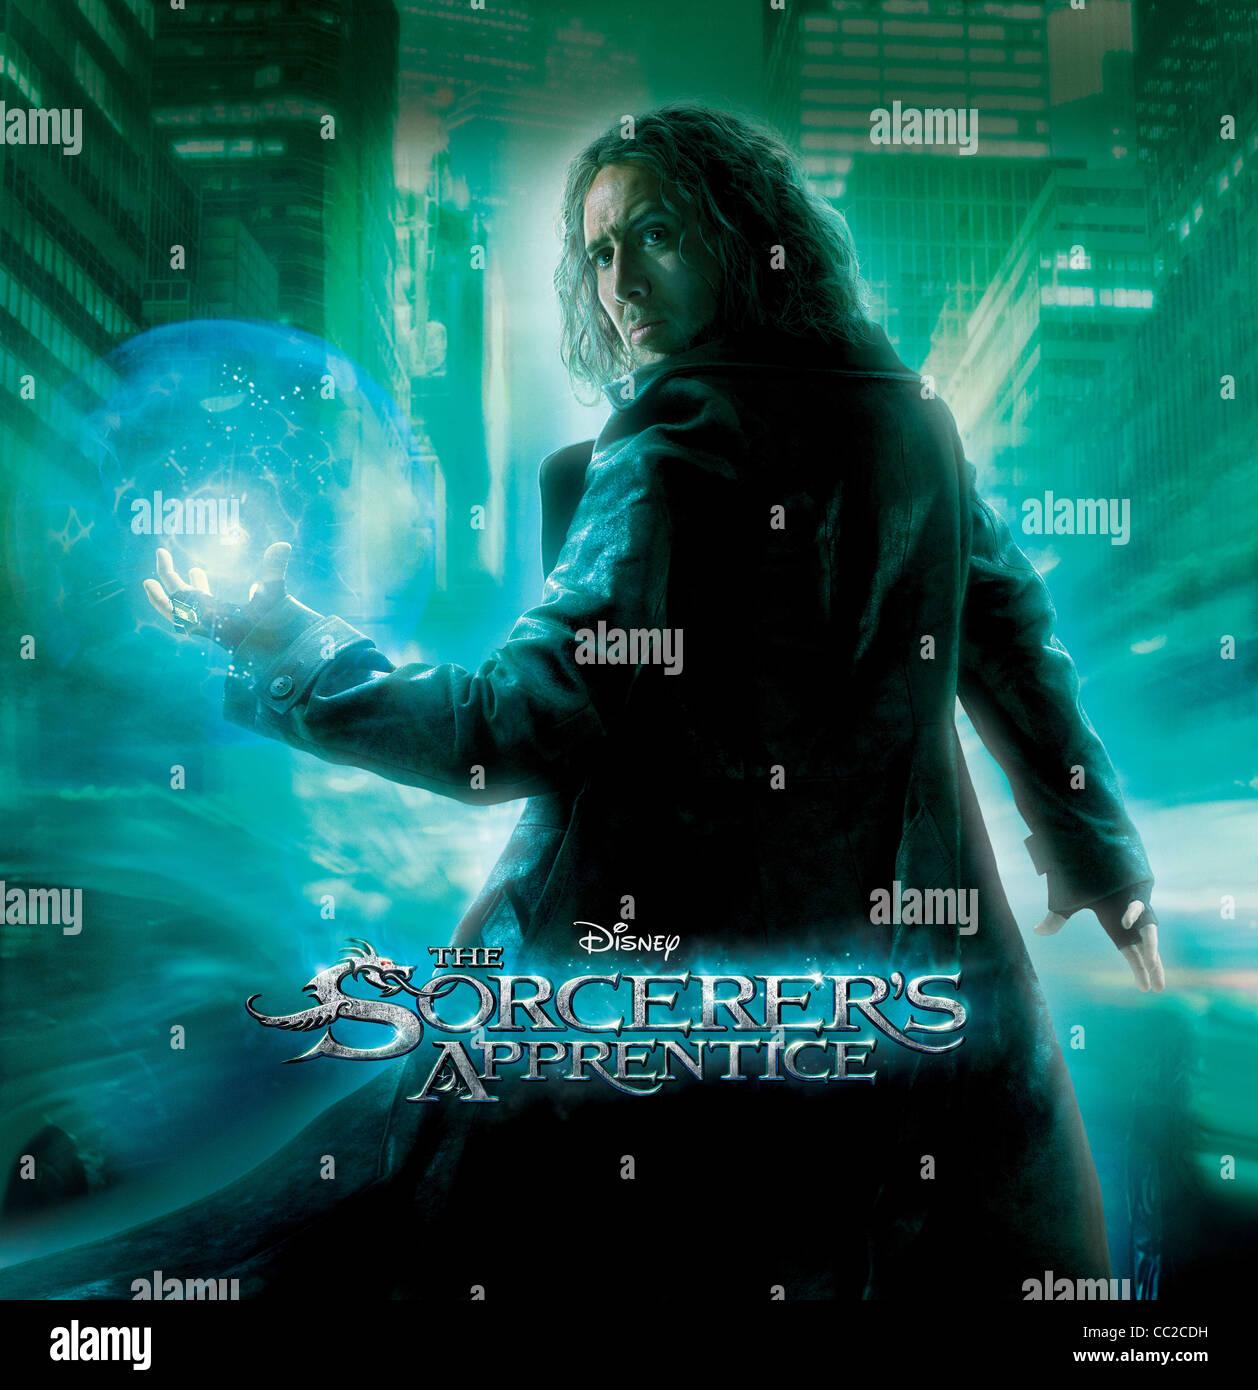 Nicolas Cage Poster The Sorcerer S Apprentice 2010 Stock Photo Alamy